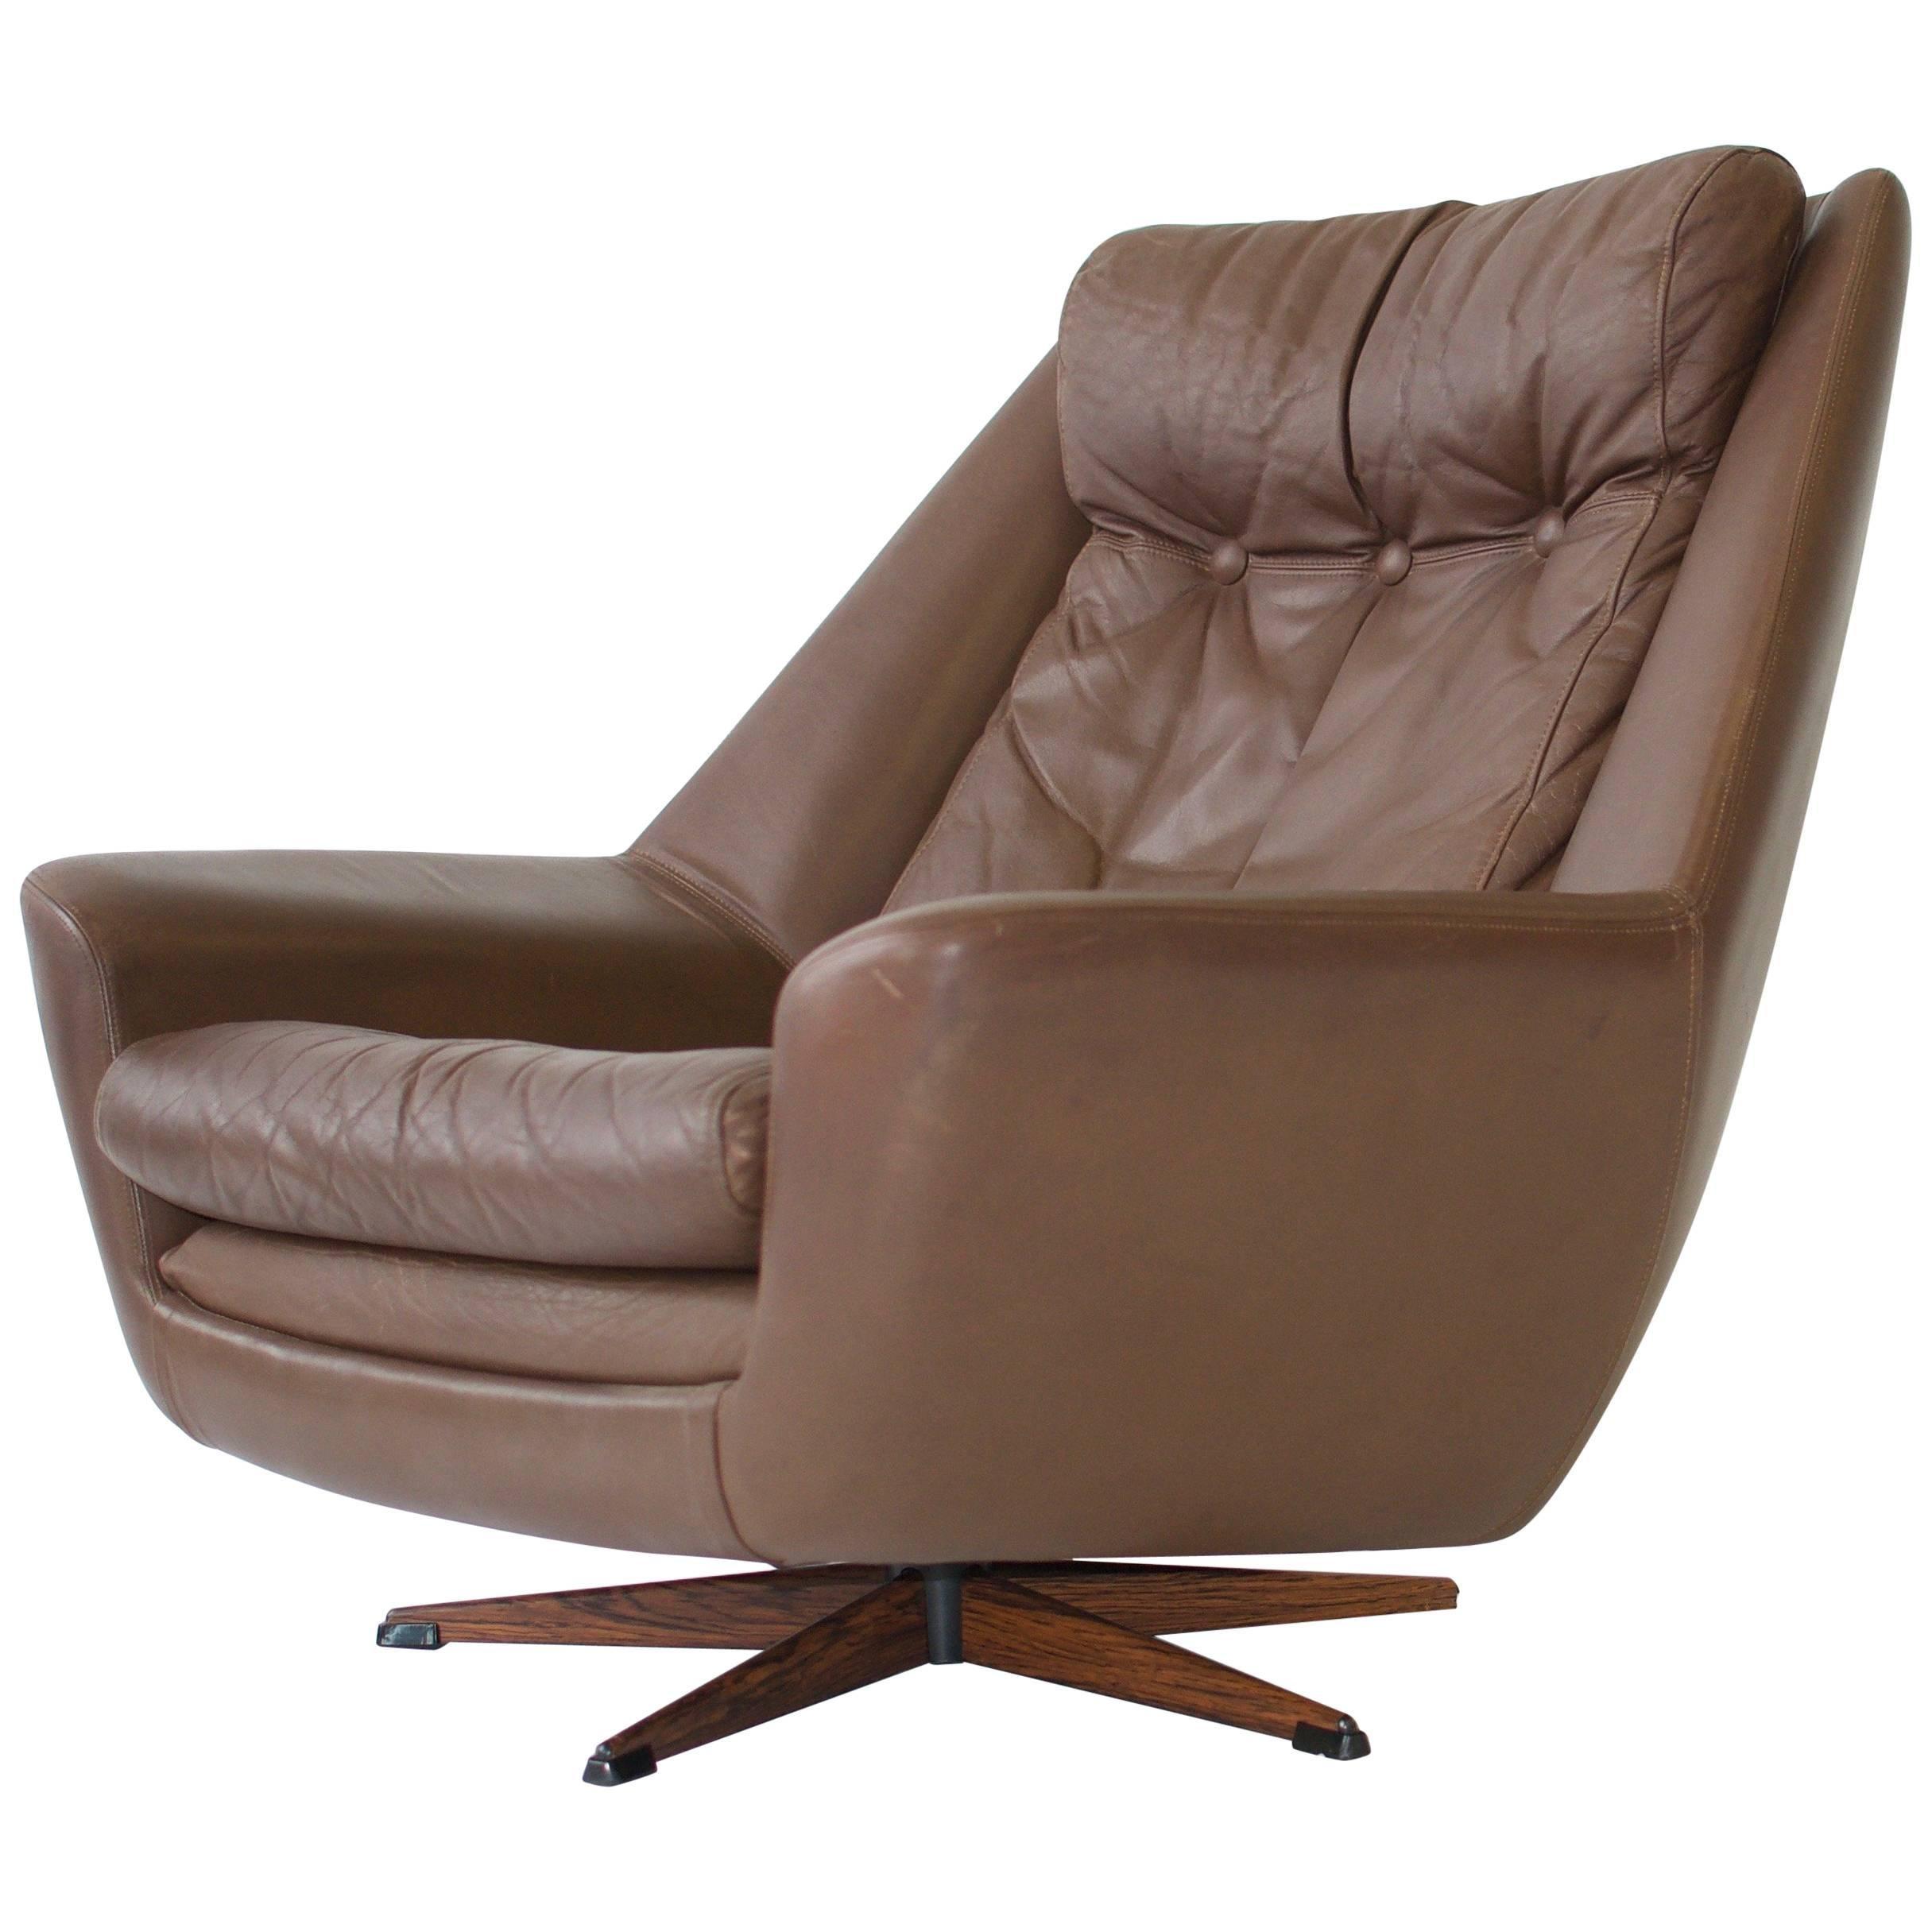 H. W. Klein Swivel Leather Lounge Chair